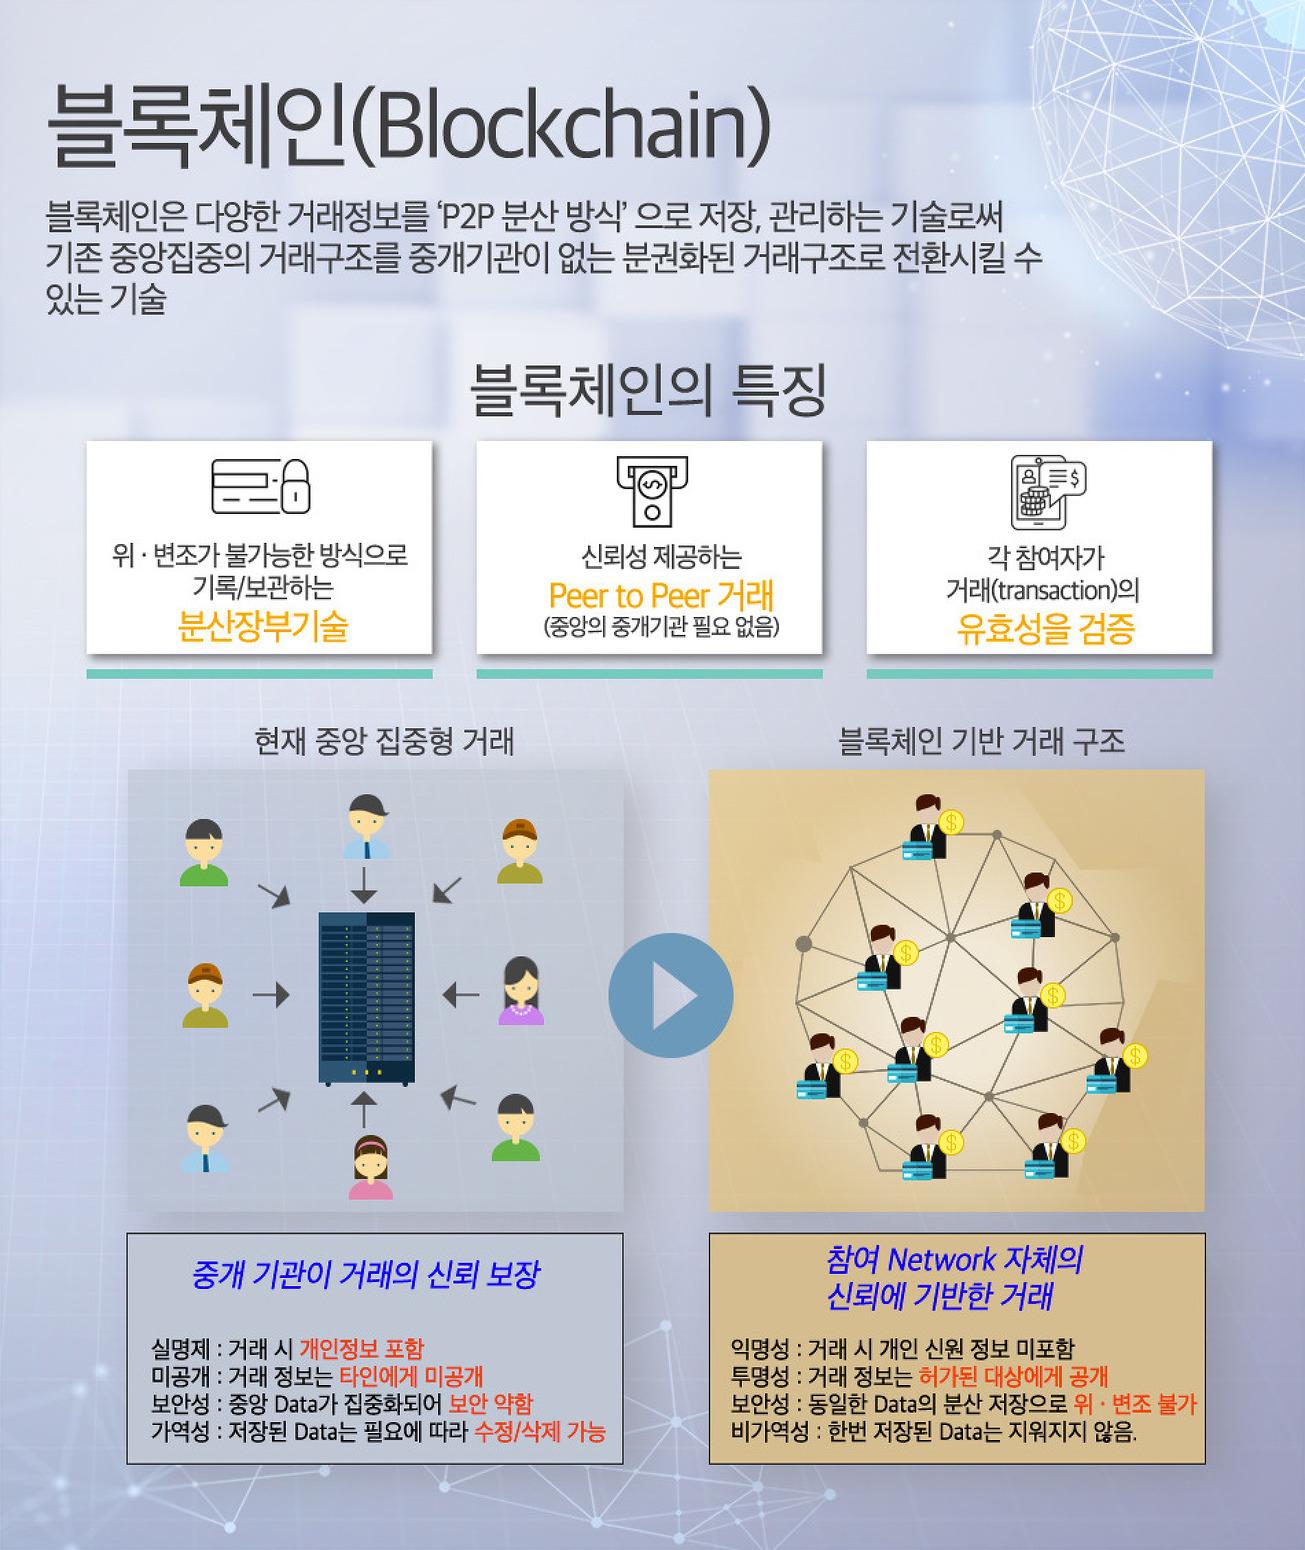 SK주식회사 C&C 블록체인(Blockchain), The technology of trust.